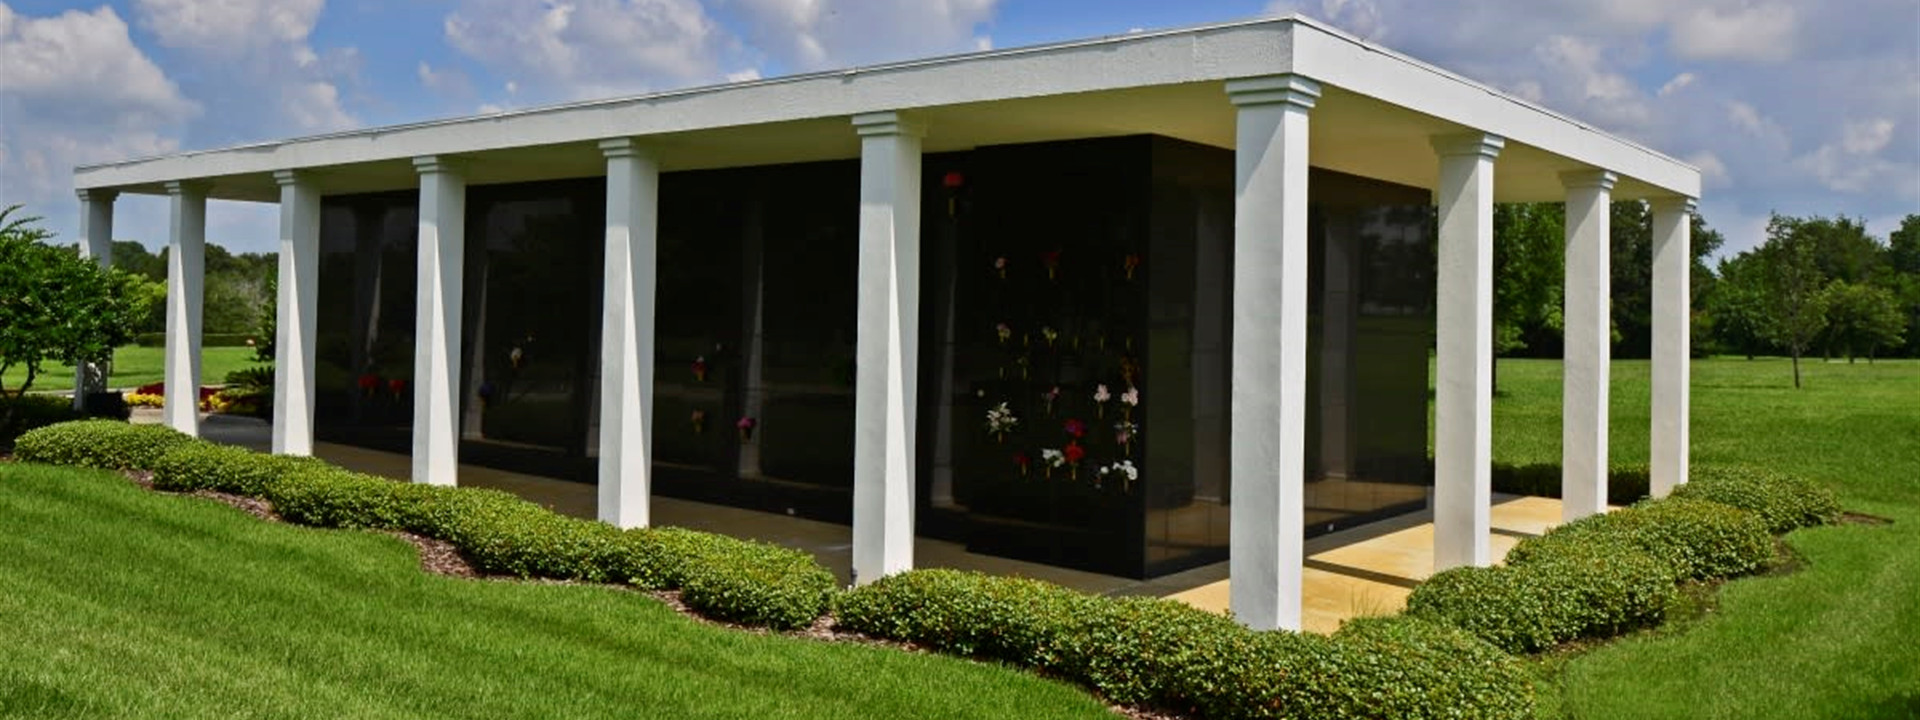 Mausoleums | Serenity Gardens